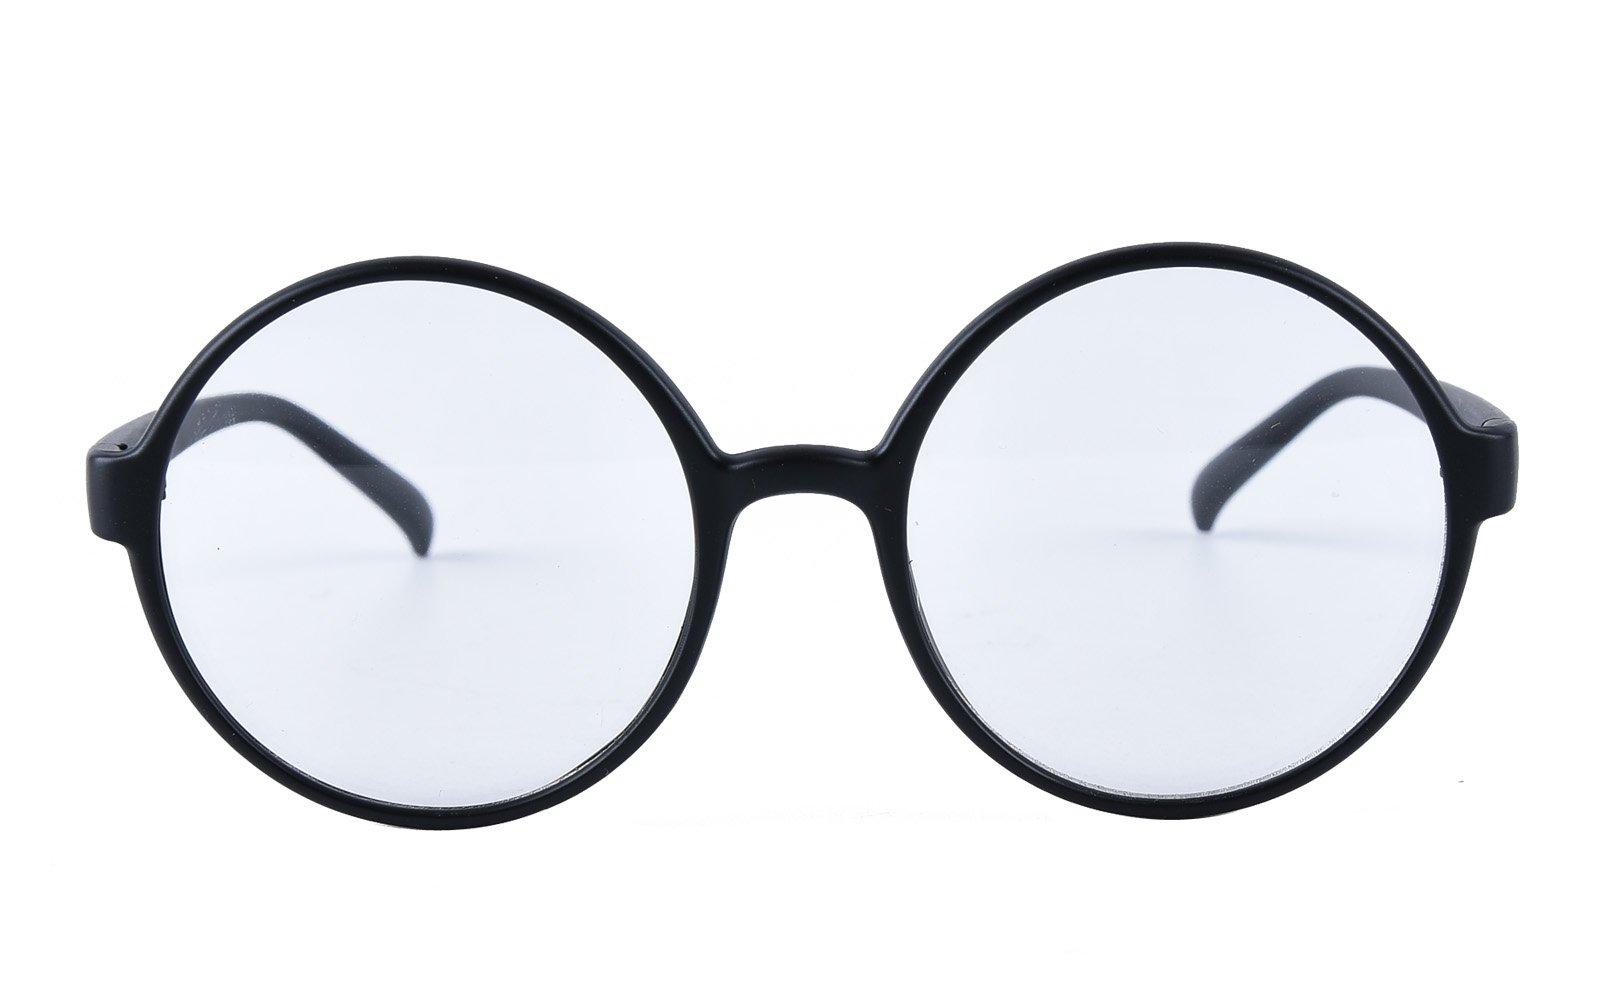 Agstum Retro Round Glasses Frame Clear Lens Fashion Circle Eyeglasses 52mm (Matte black, 52mm) by Agstum